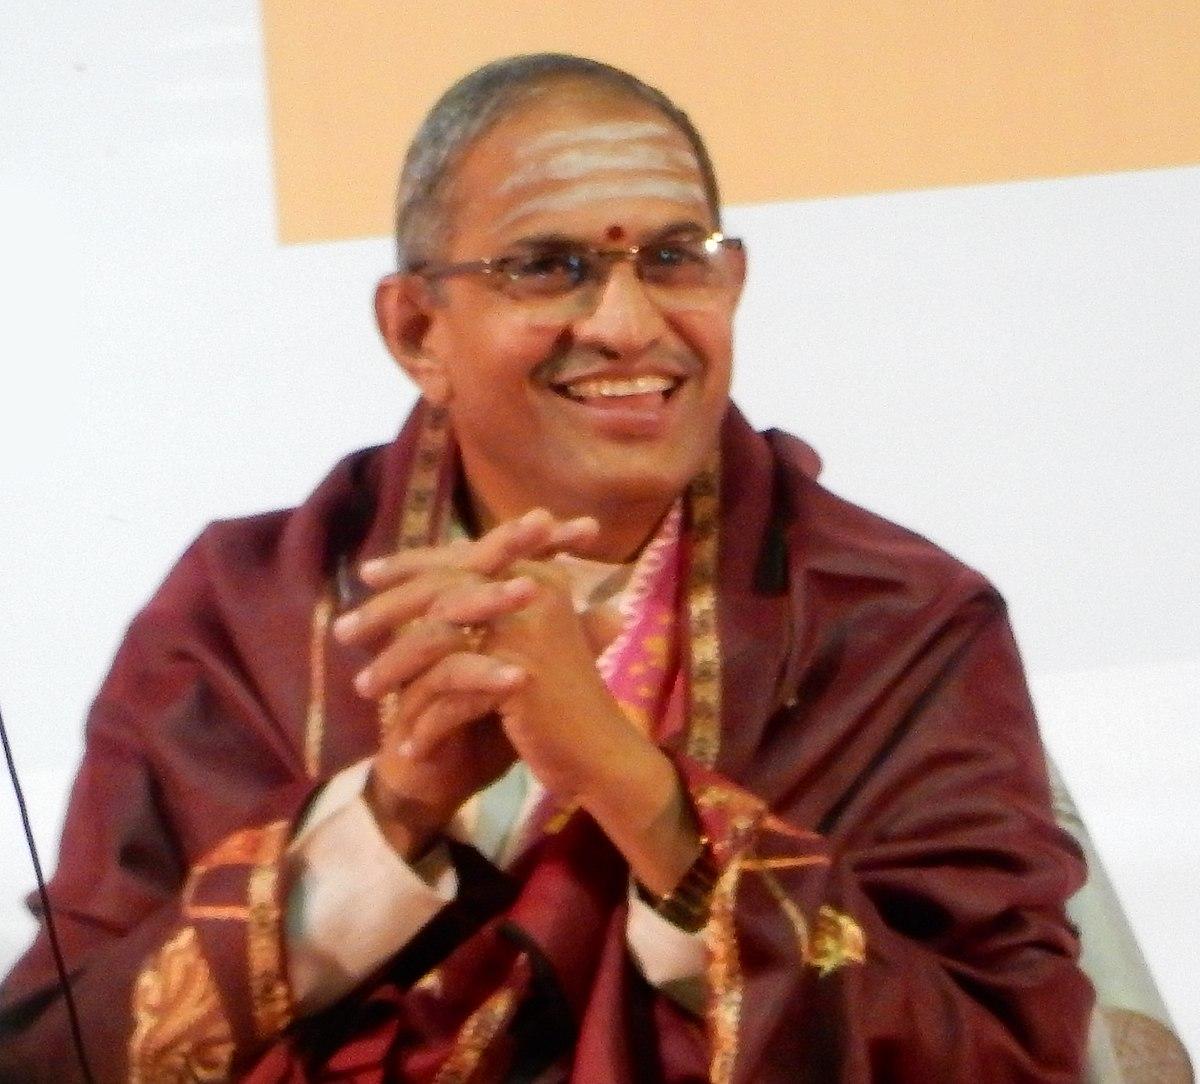 Chaganti Koteswara Rao Wikidata